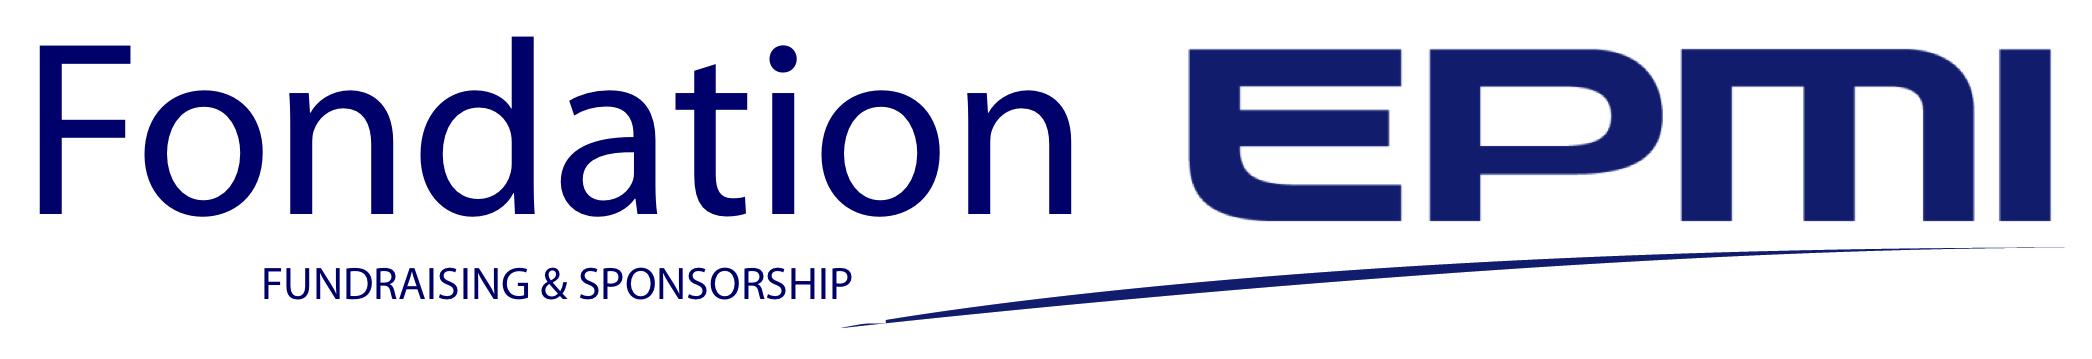 http://www.ecam-epmi.fr/wp-content/uploads/2014/12/fondation-epmi1.png